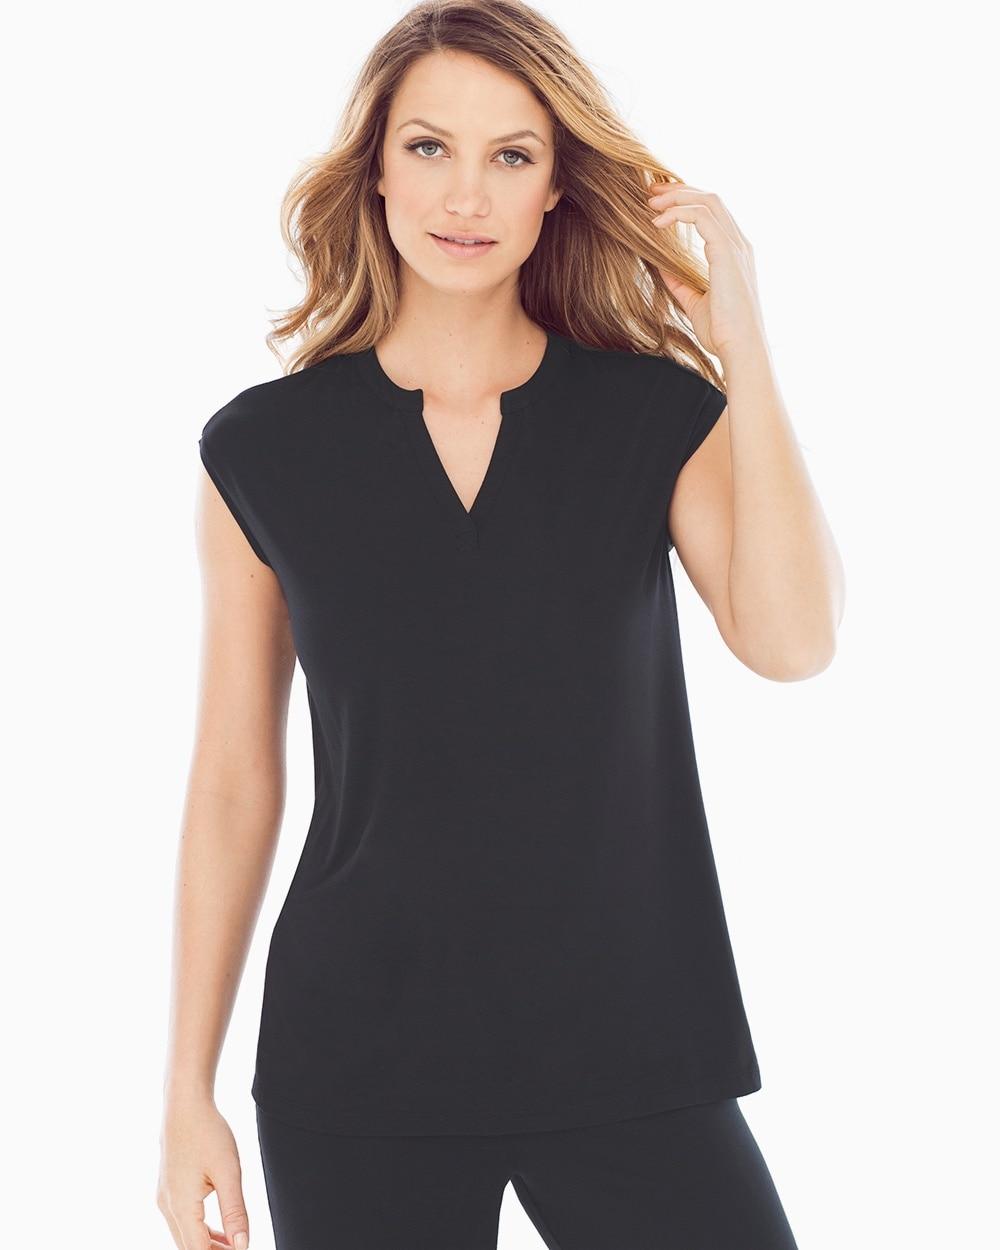 a5e6c9921c 1570143093. Video. Zoom. Cap Sleeve V-Neck Popover Pajama Top Black